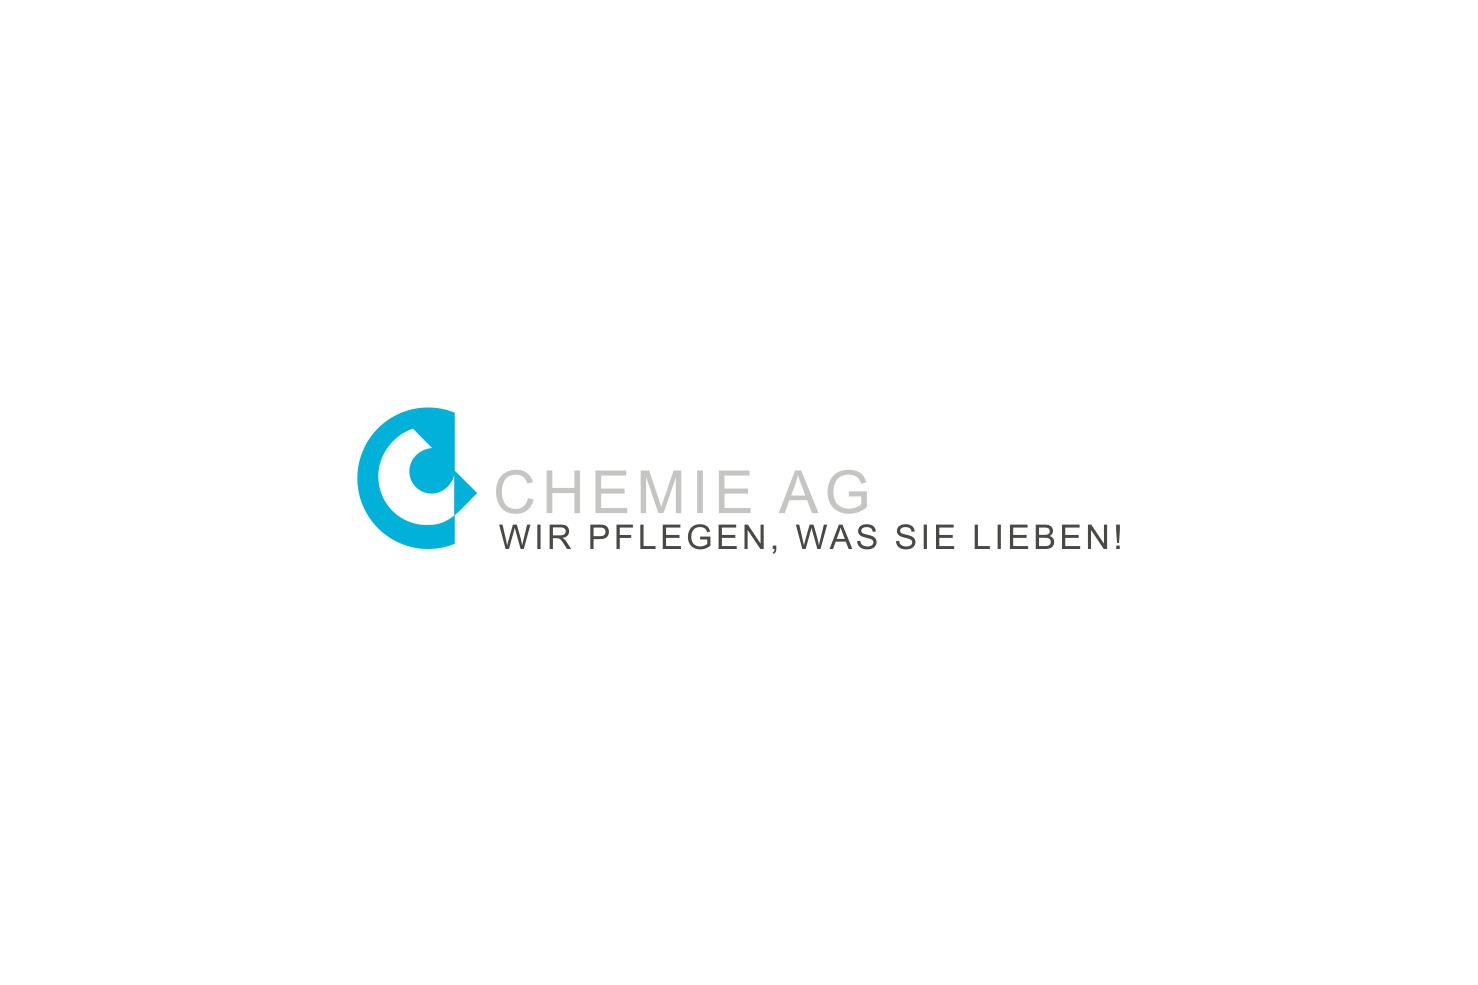 Bild 4 vom Chemie AG Grafikdesign